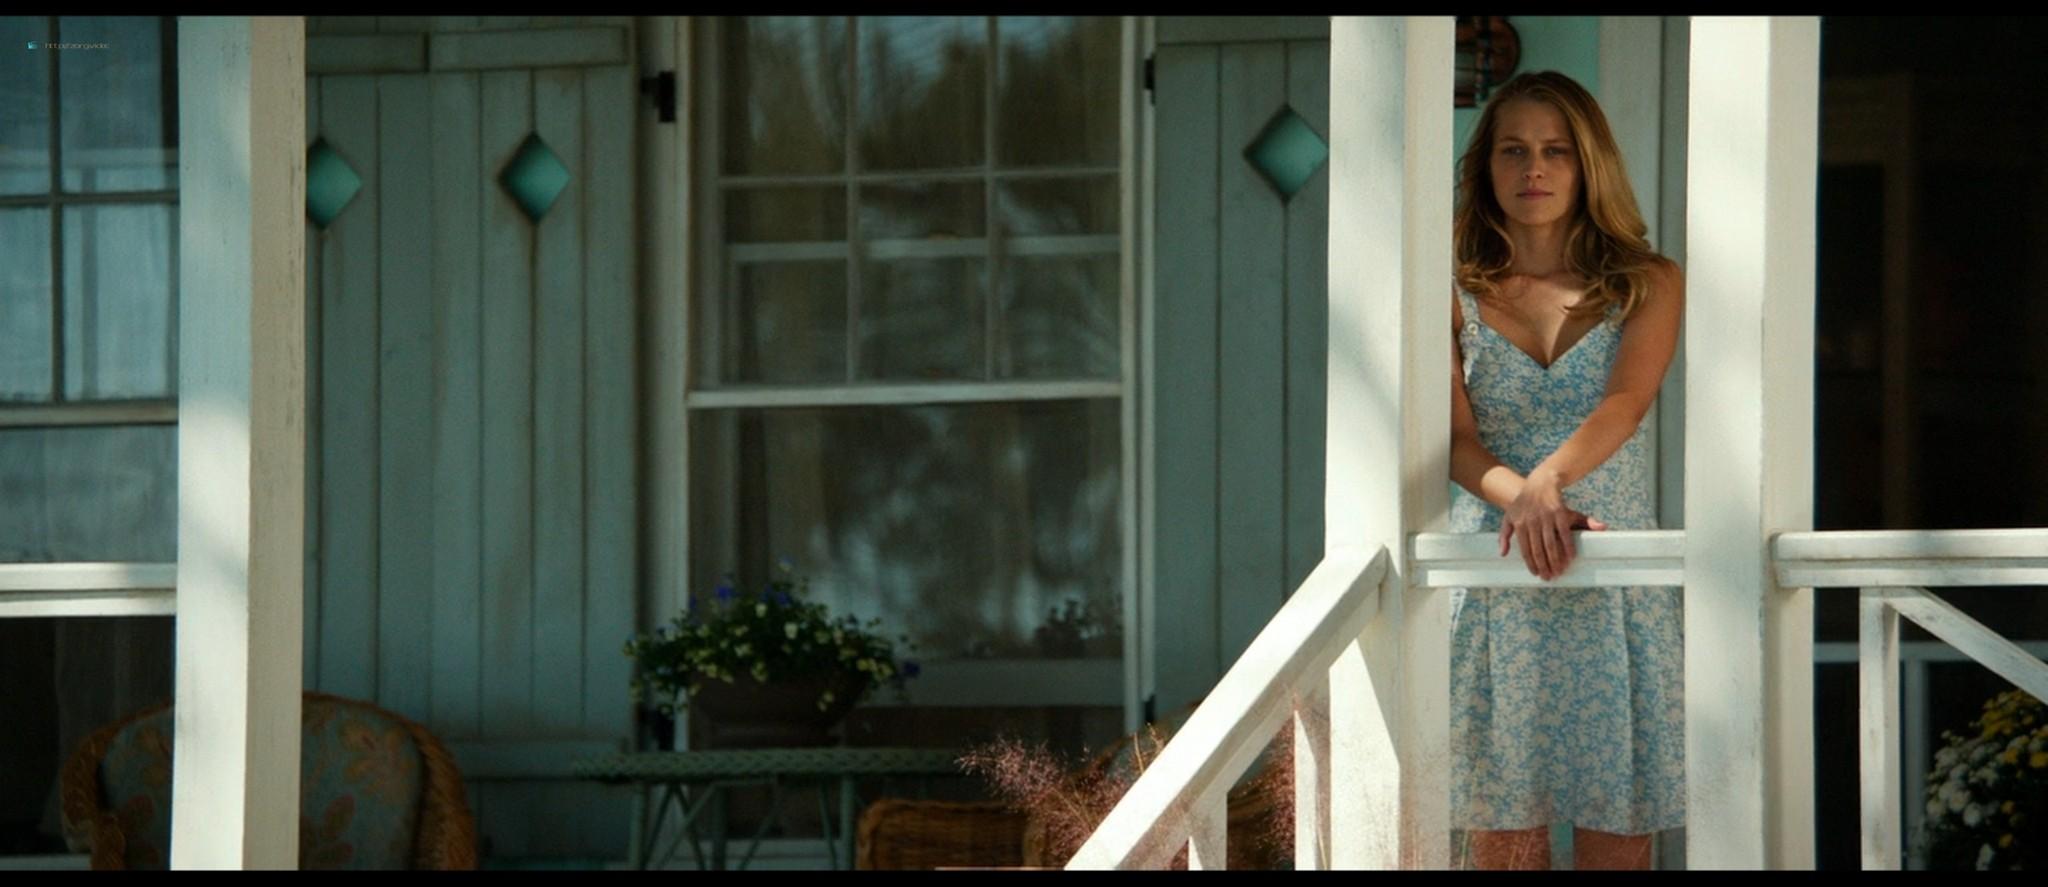 Teresa Palmer hot bikini and Maggie Grace, Alexandra Daddario hot too - The Choice (2016) HD 1080p BluRay (17)